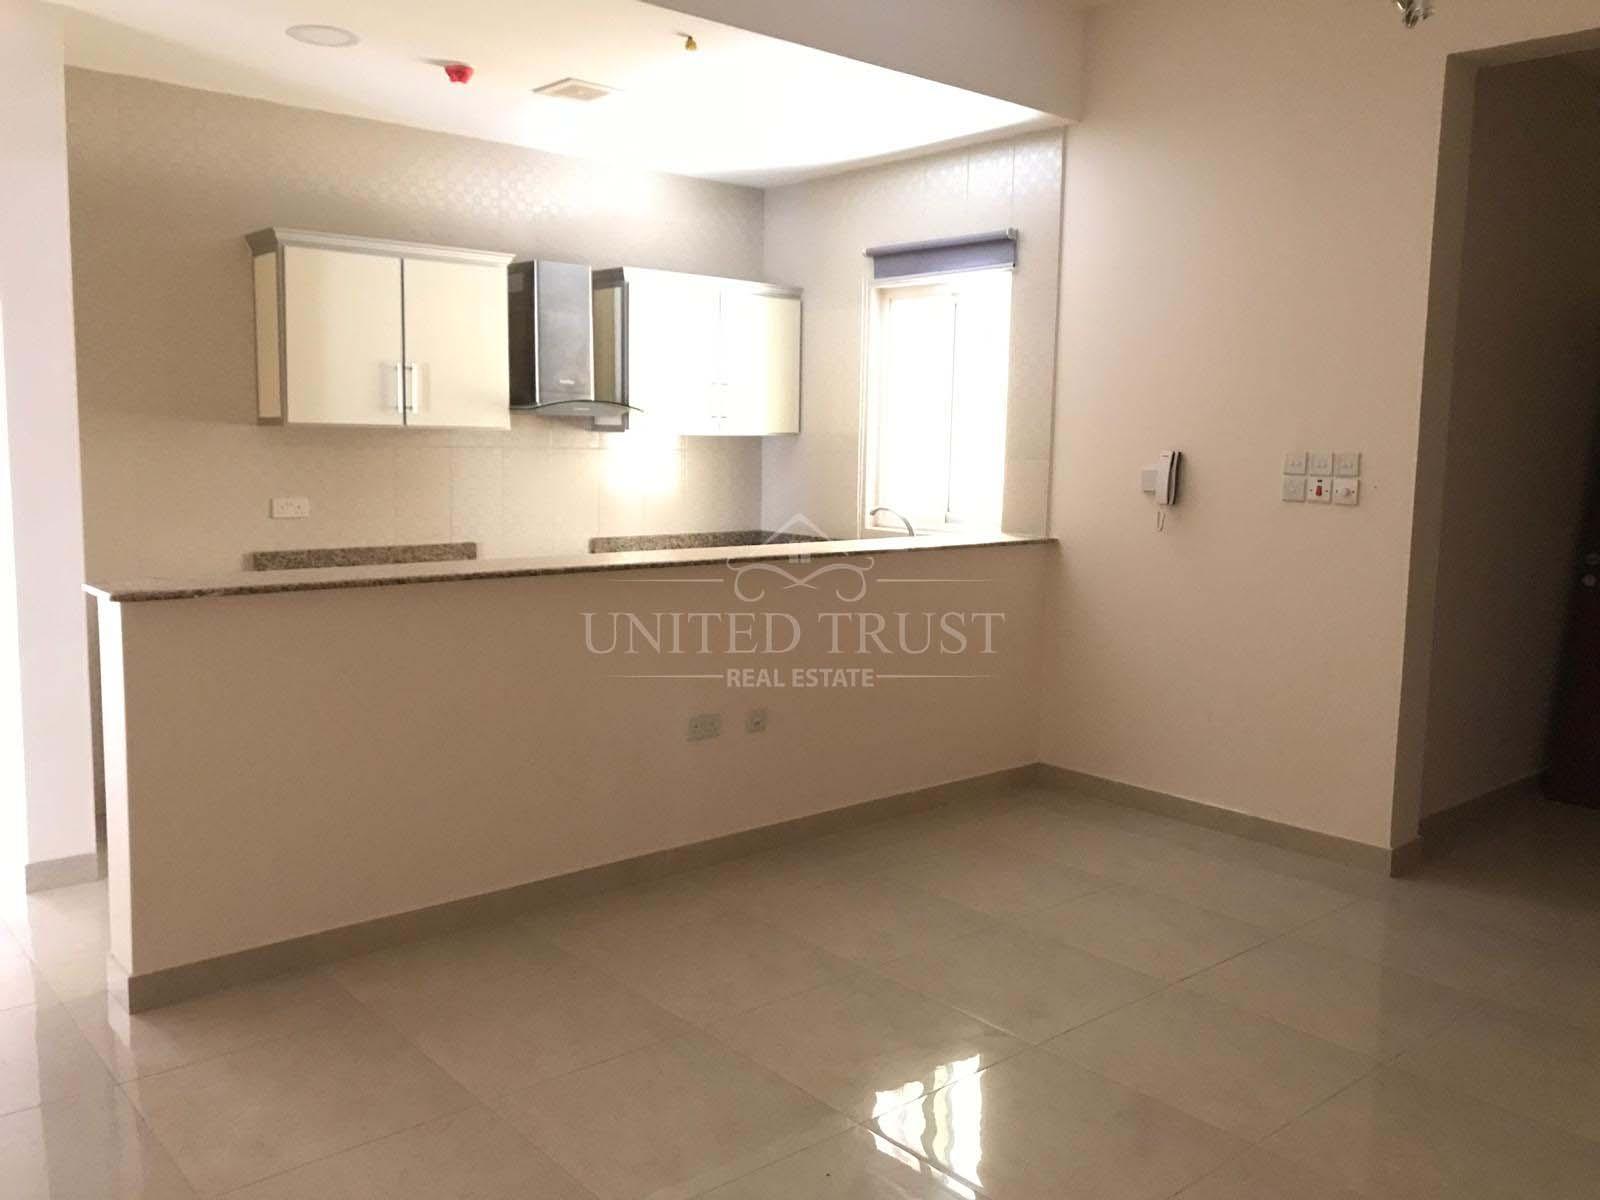 For rent a Flat in Tubli Ref: TUB-AZ-023